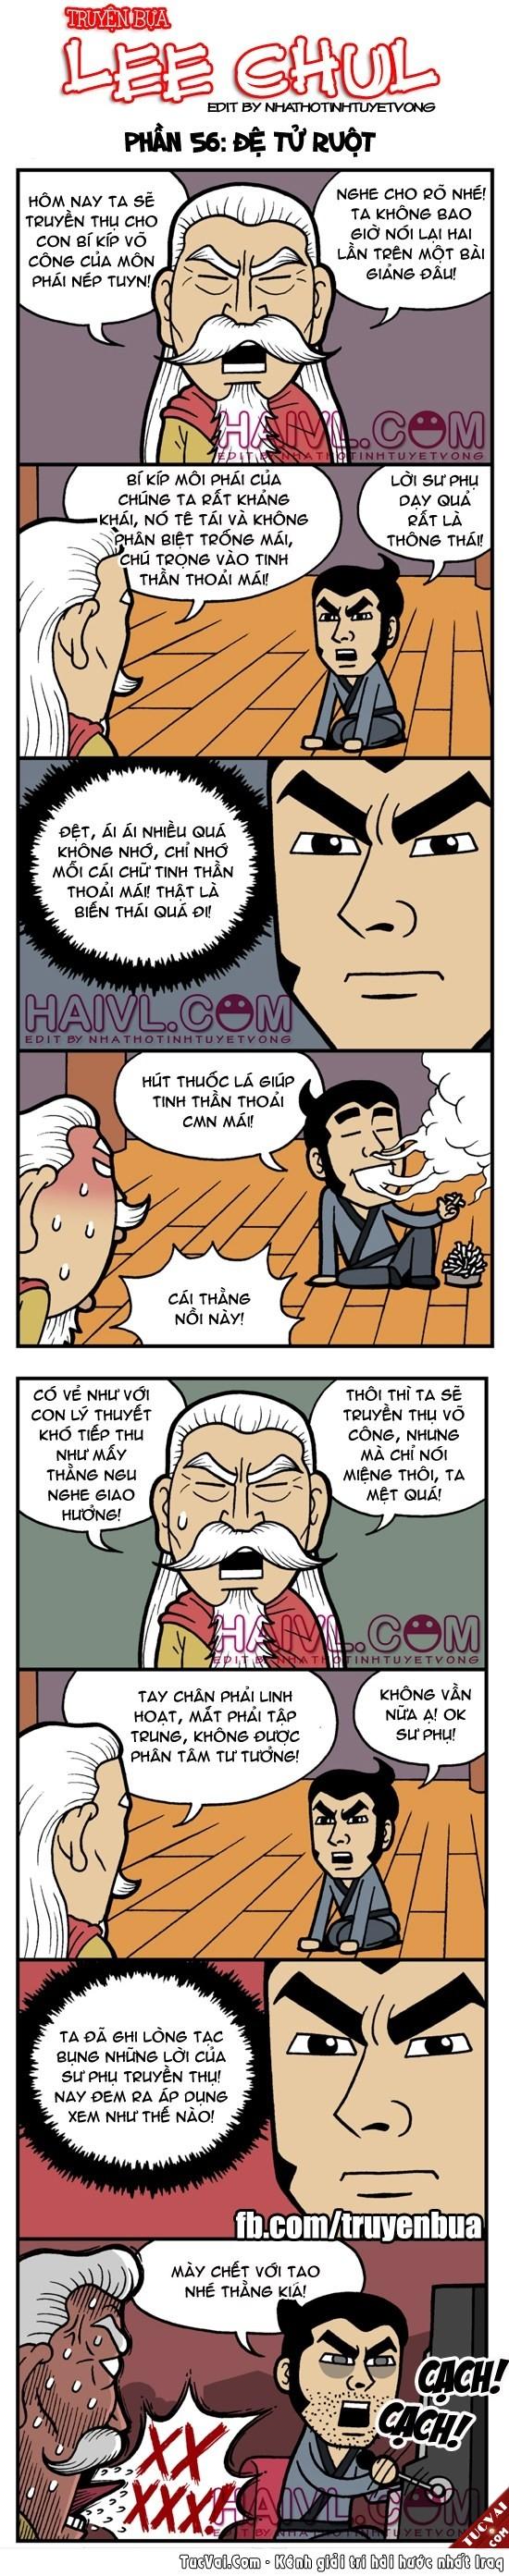 Truyện Bựa Lee Chul Phần 56,58,59,60